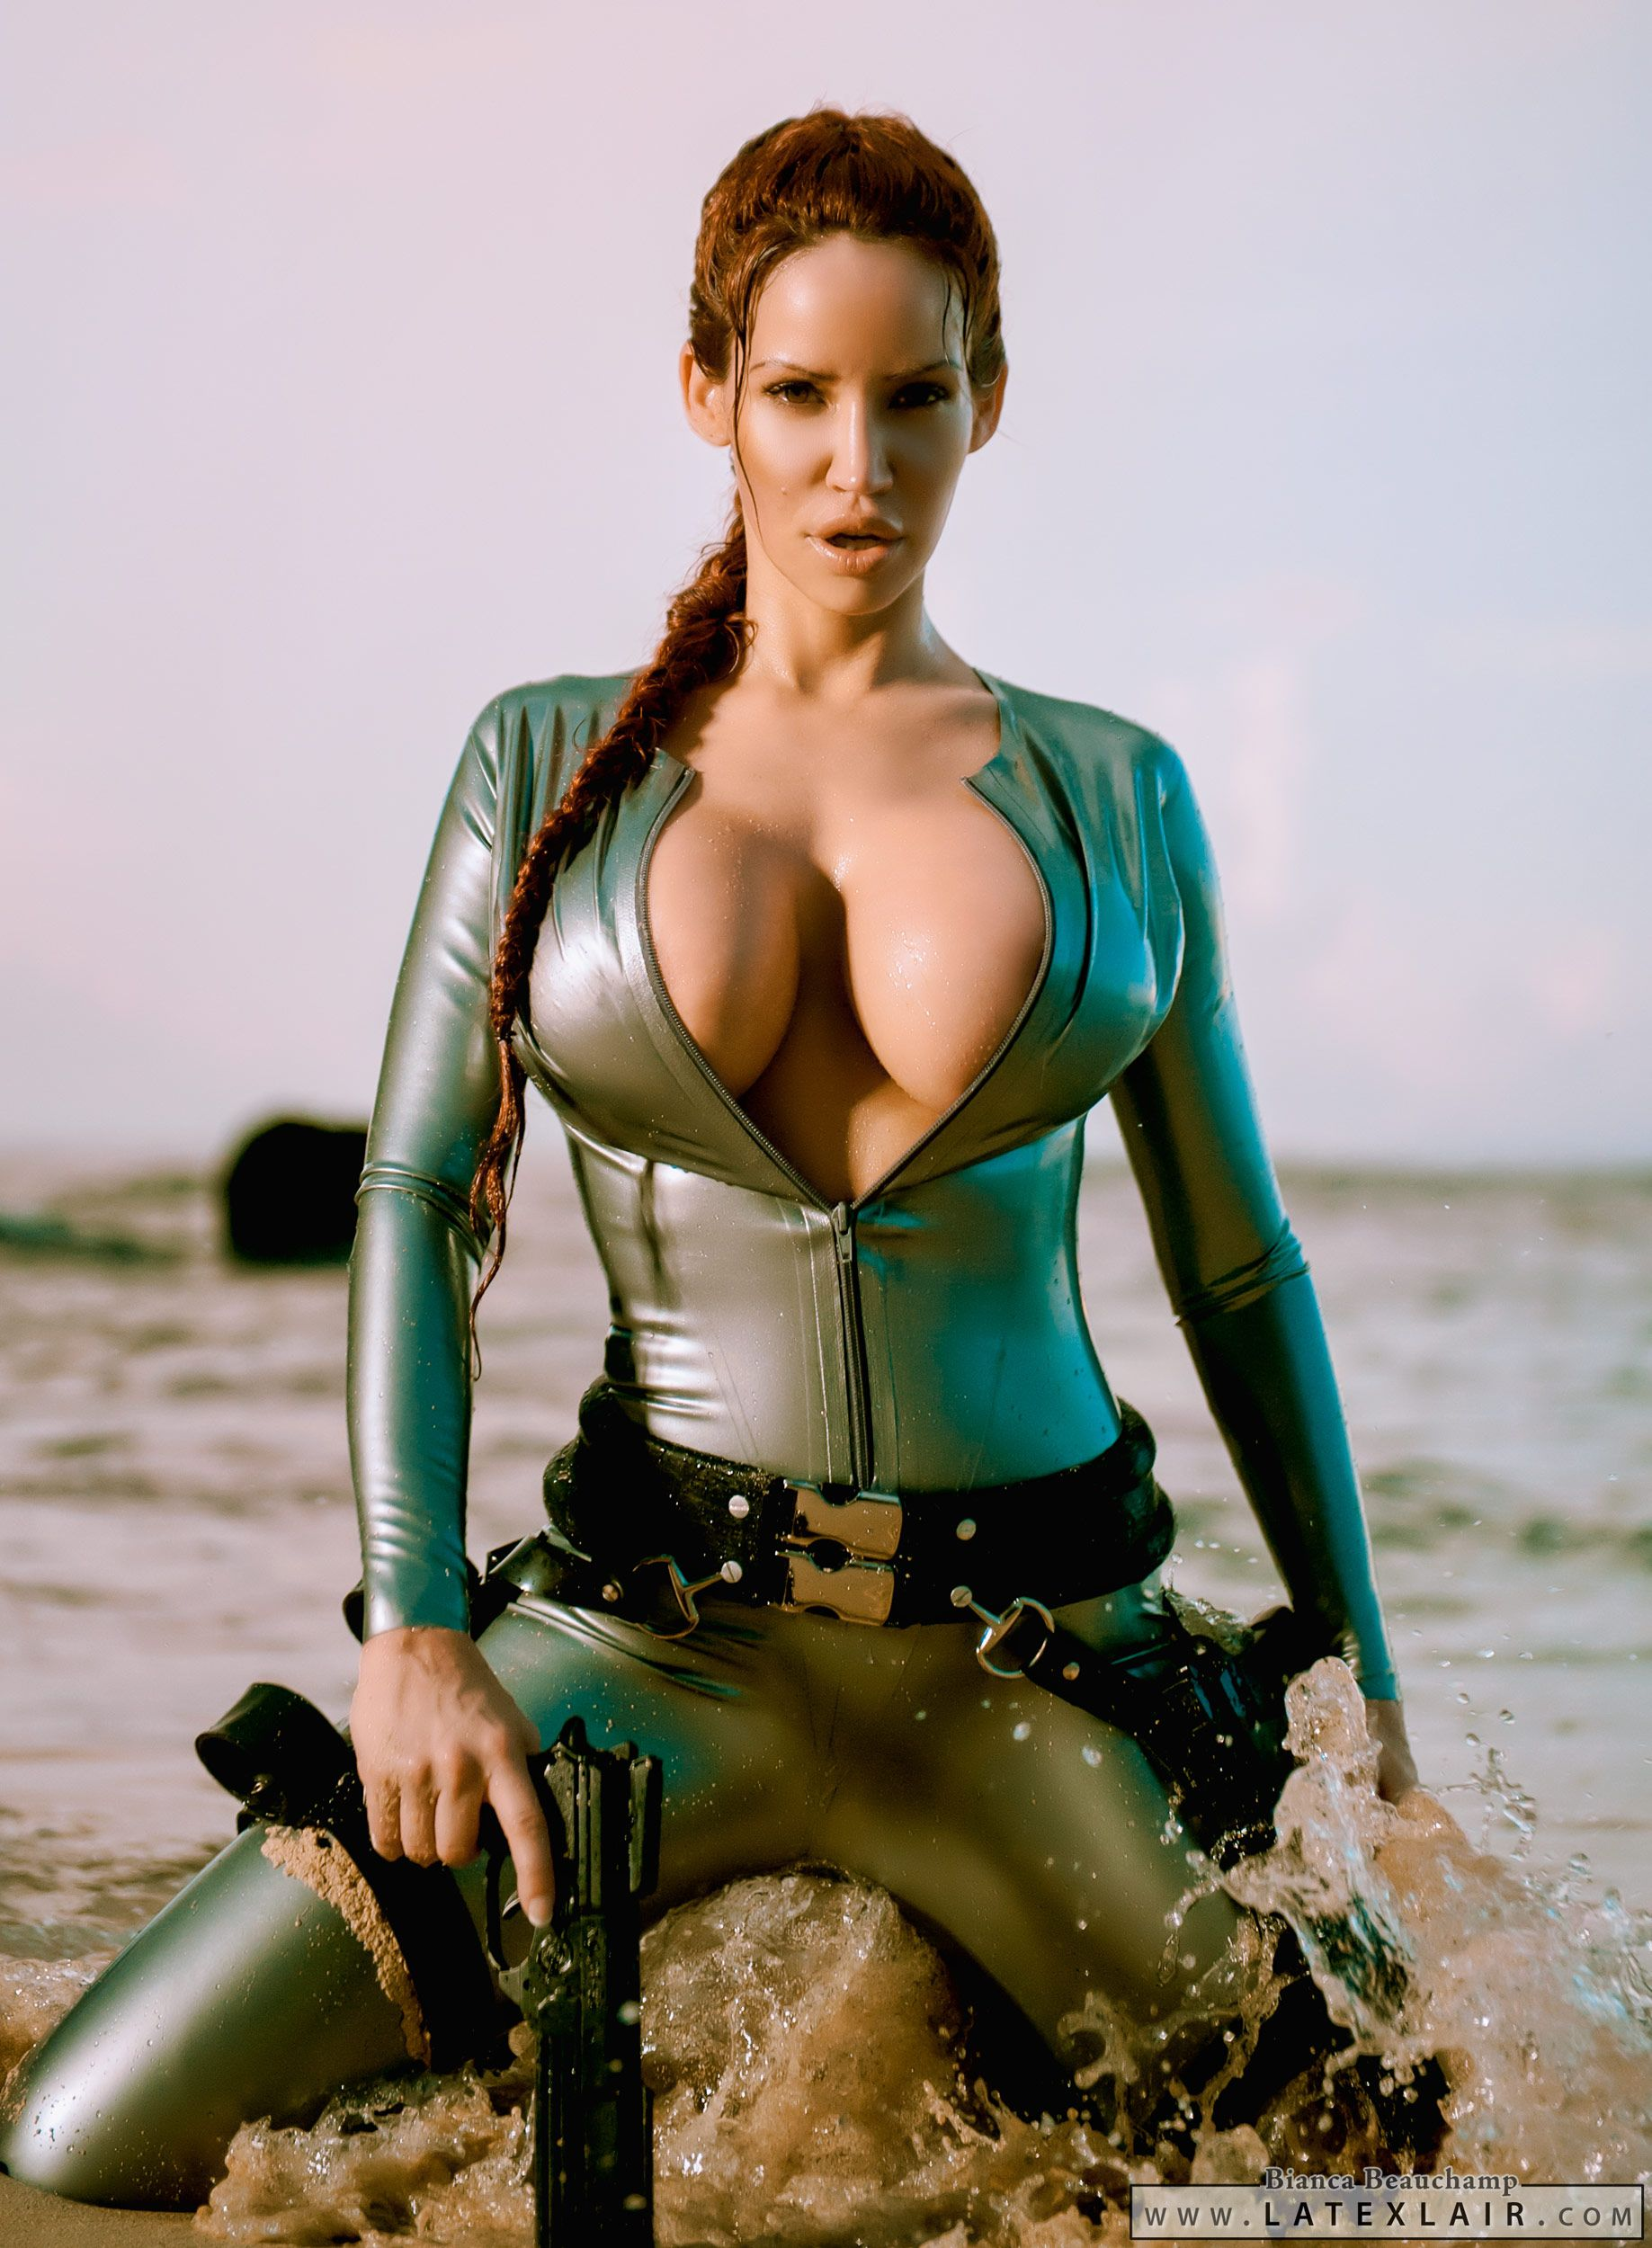 Celebrites Bianca Beauchamp nudes (94 pics), Ass